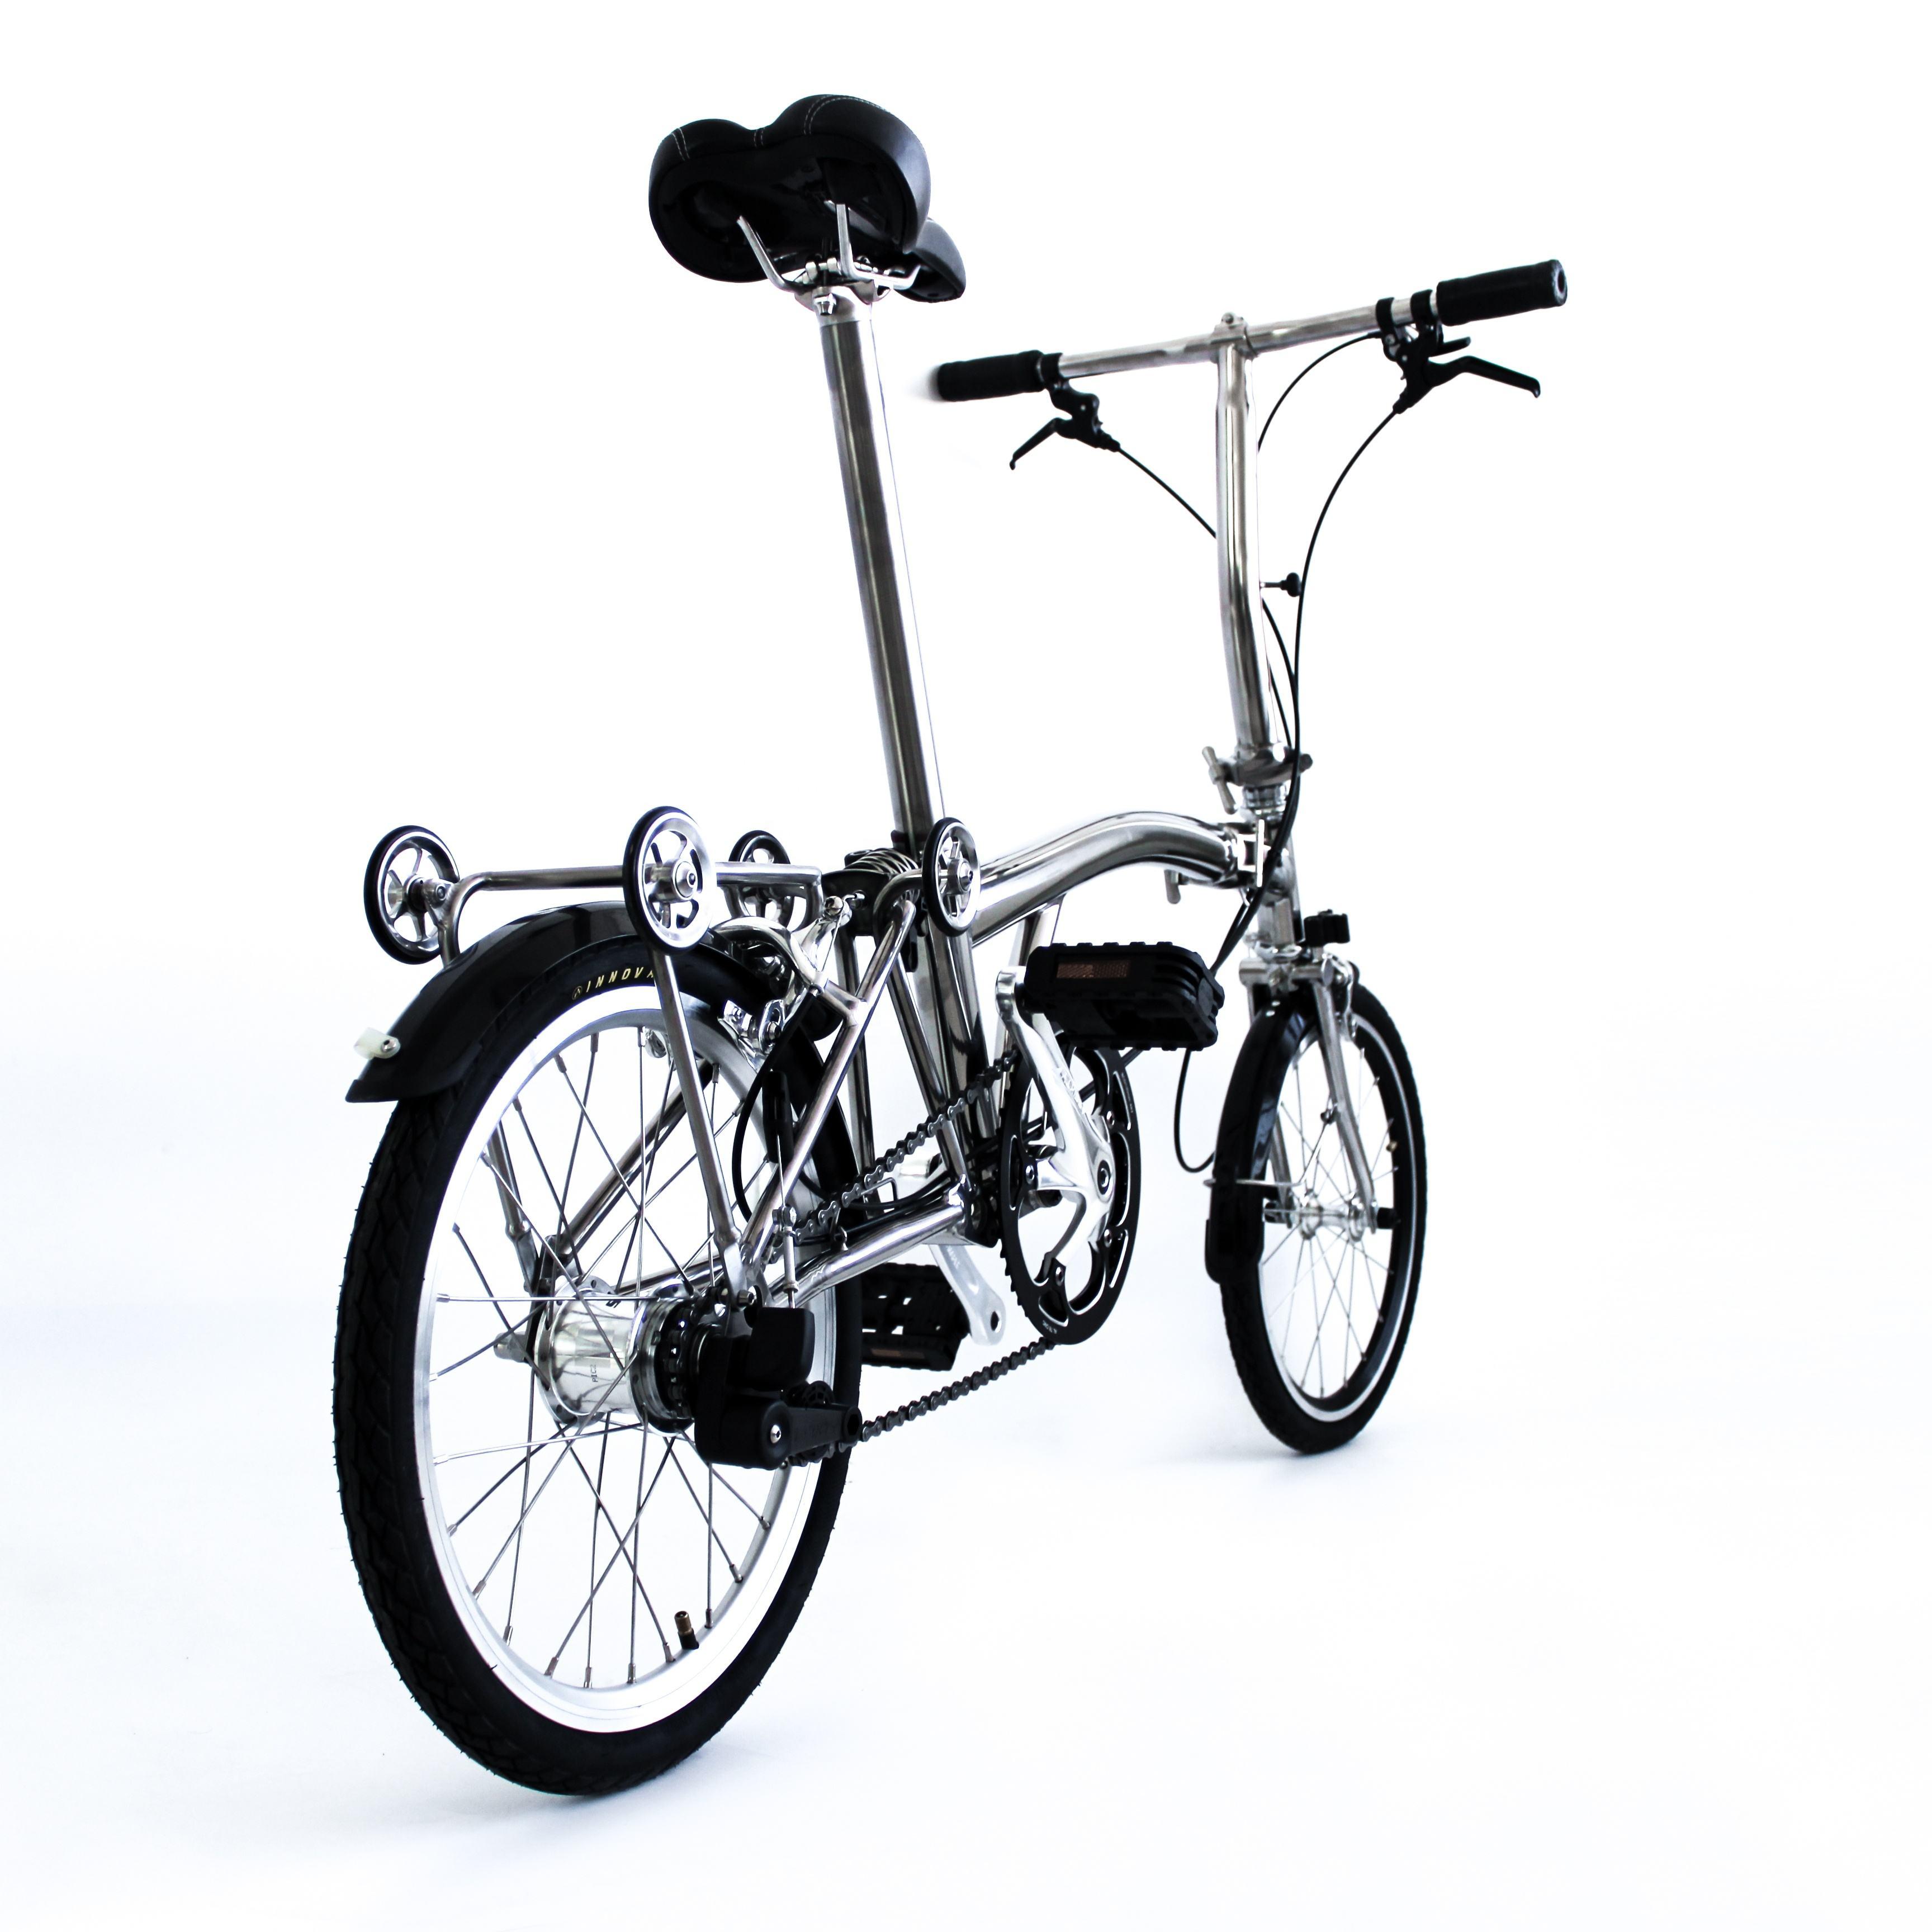 1 Pair Bicycle Thomson Seatpost Titanium Ti Bolts+Barrel Nut/&Washer M5x30